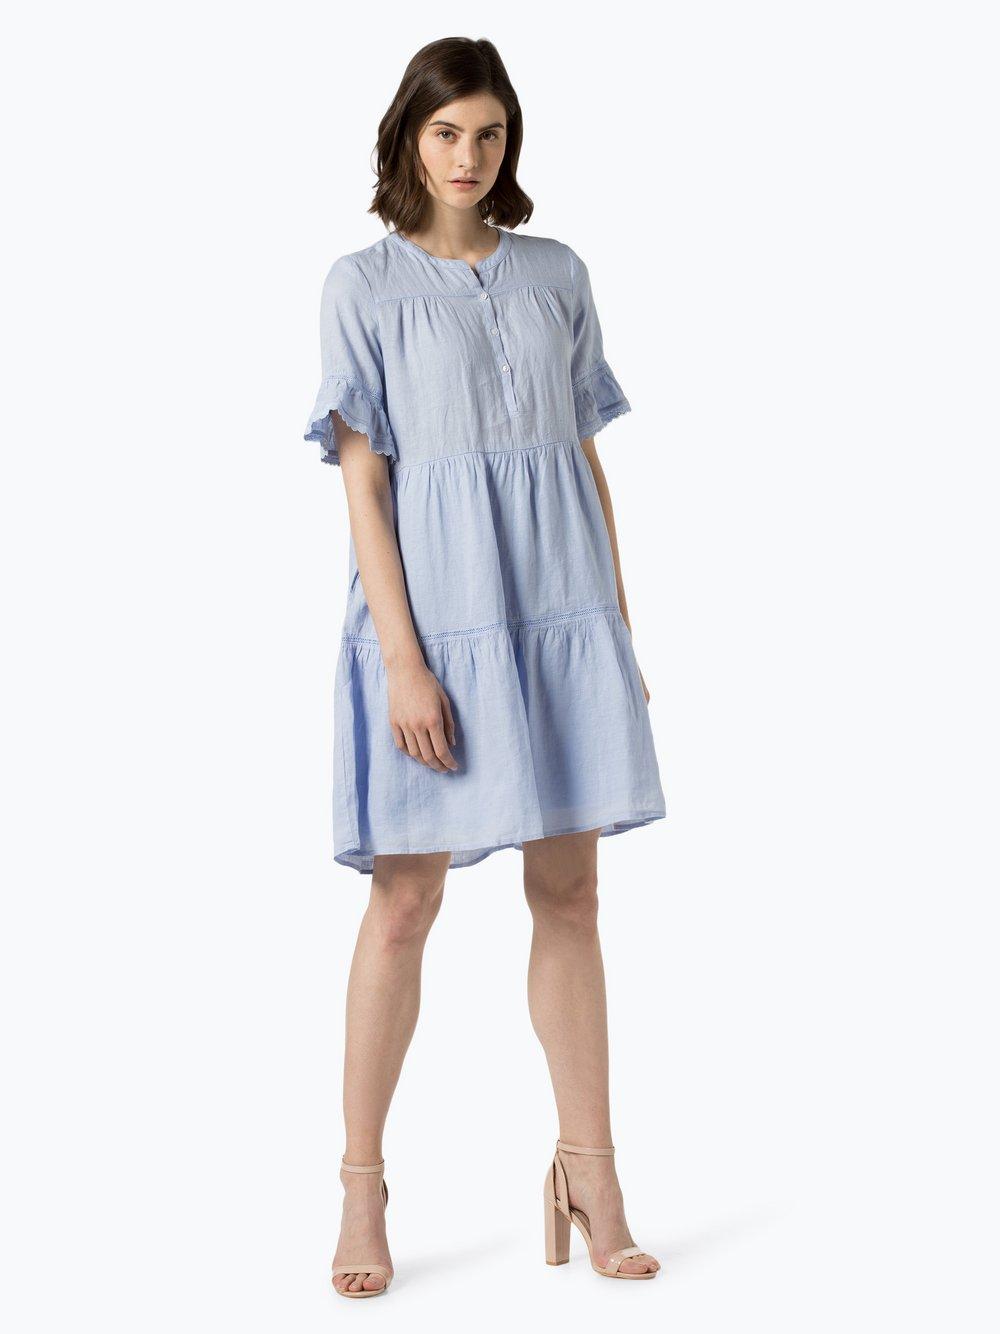 0039 Italy - Damska sukienka lniana, niebieski